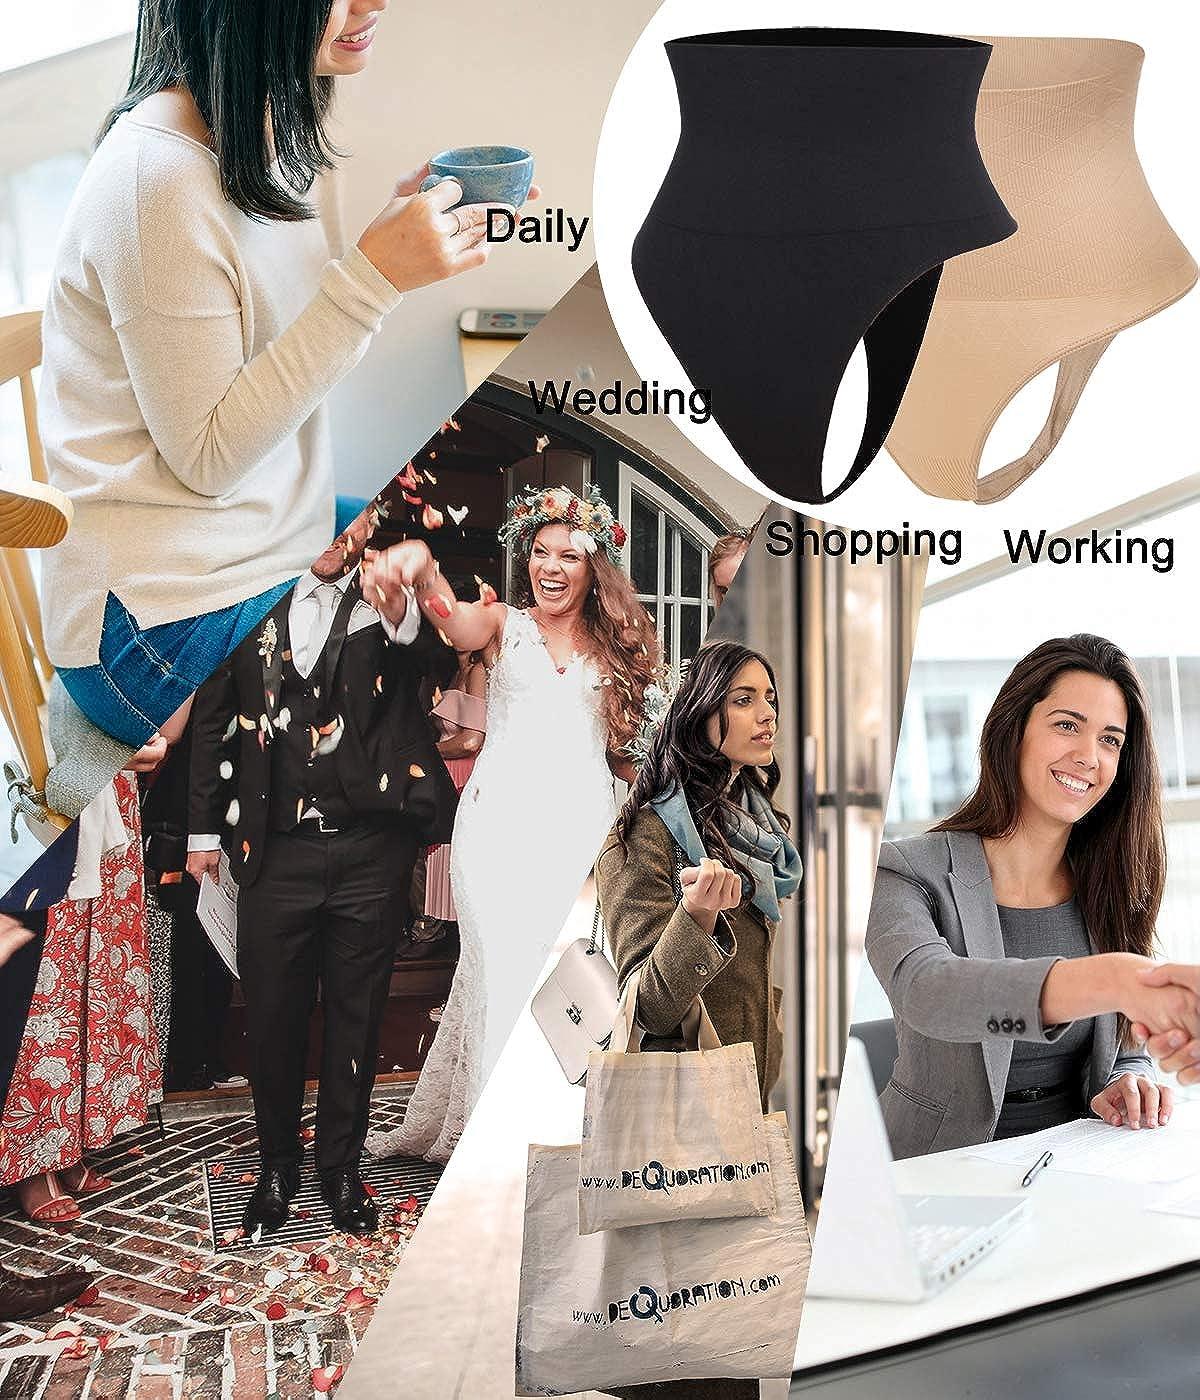 SLIMBELLE Mujer Faja Cintura De Braga Alta Shapewear Bragas Braguitas Adelgazante con Abdomen Reductora Control Moldeadoras